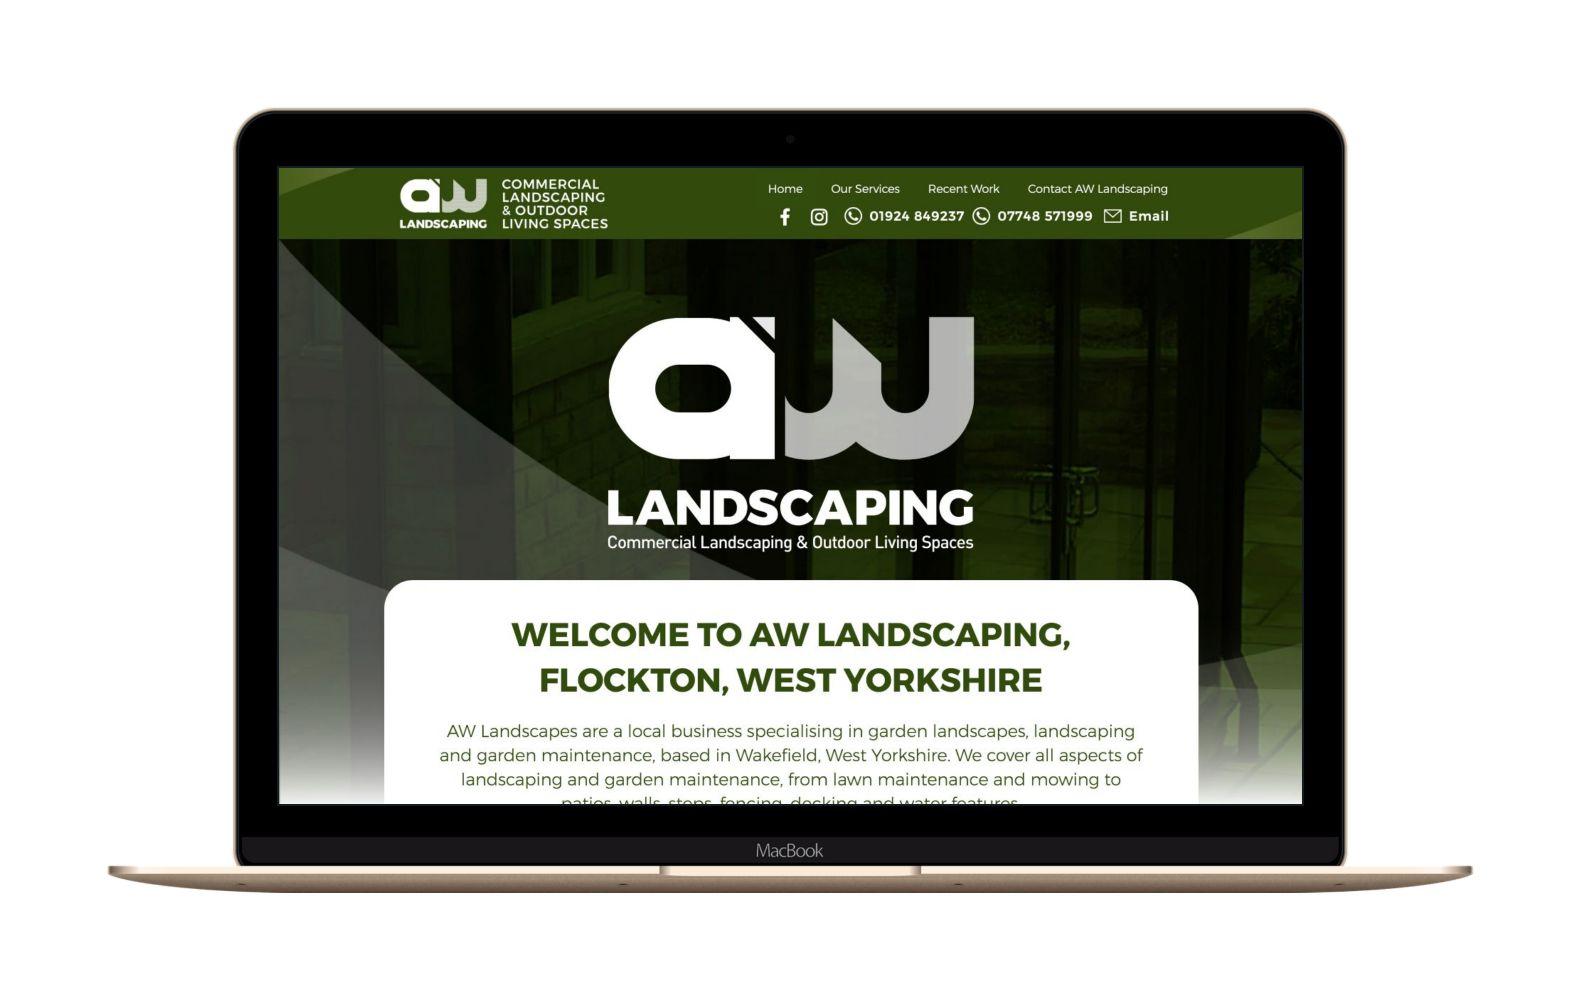 Website Design for AW Landscaping